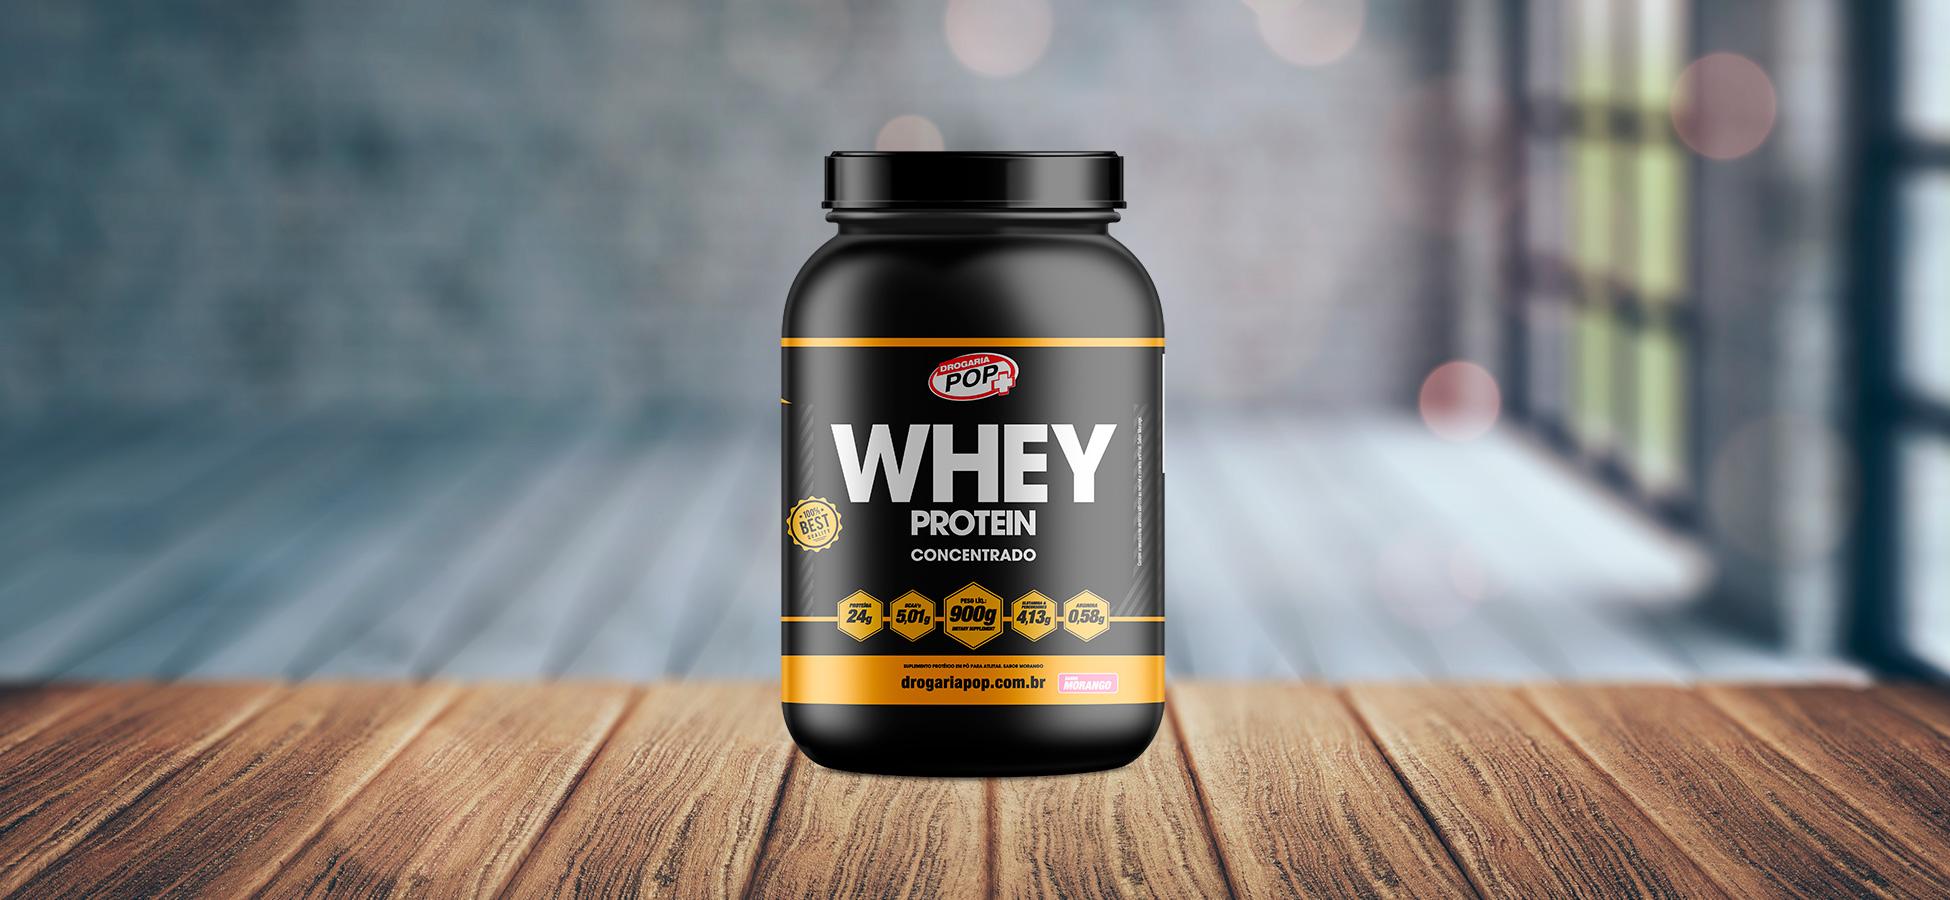 Banner: Whey Protein Morango 900g